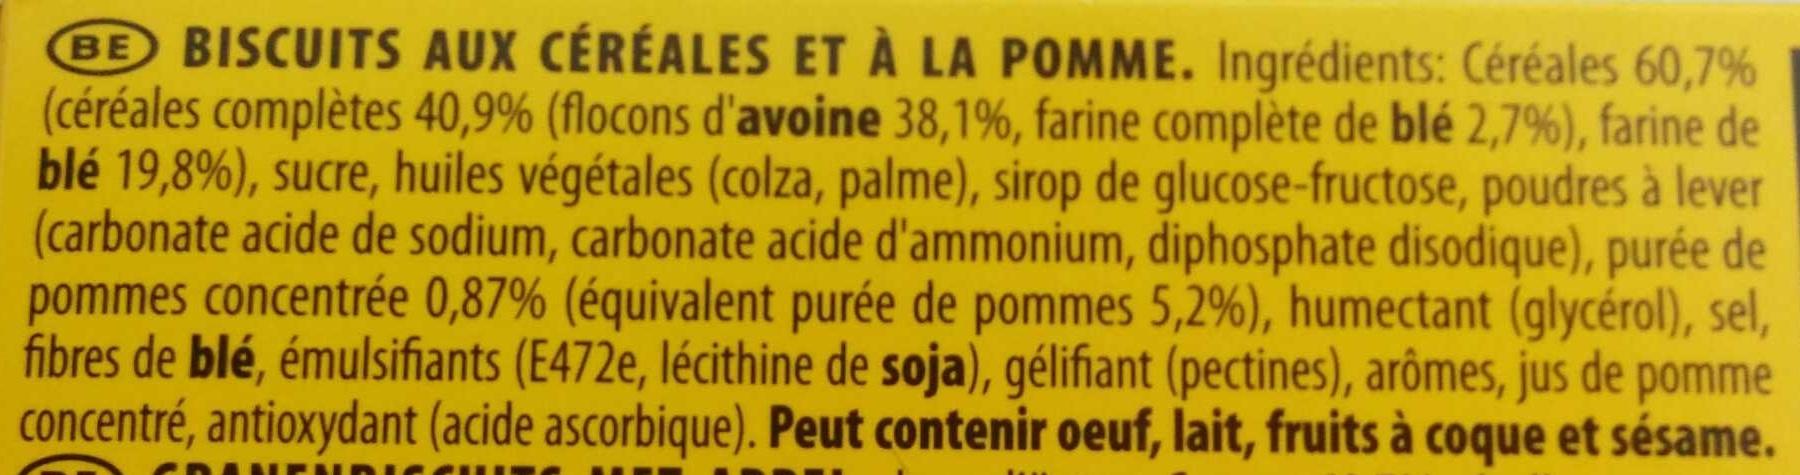 Biscuit Grany pomme - Ingrediënten